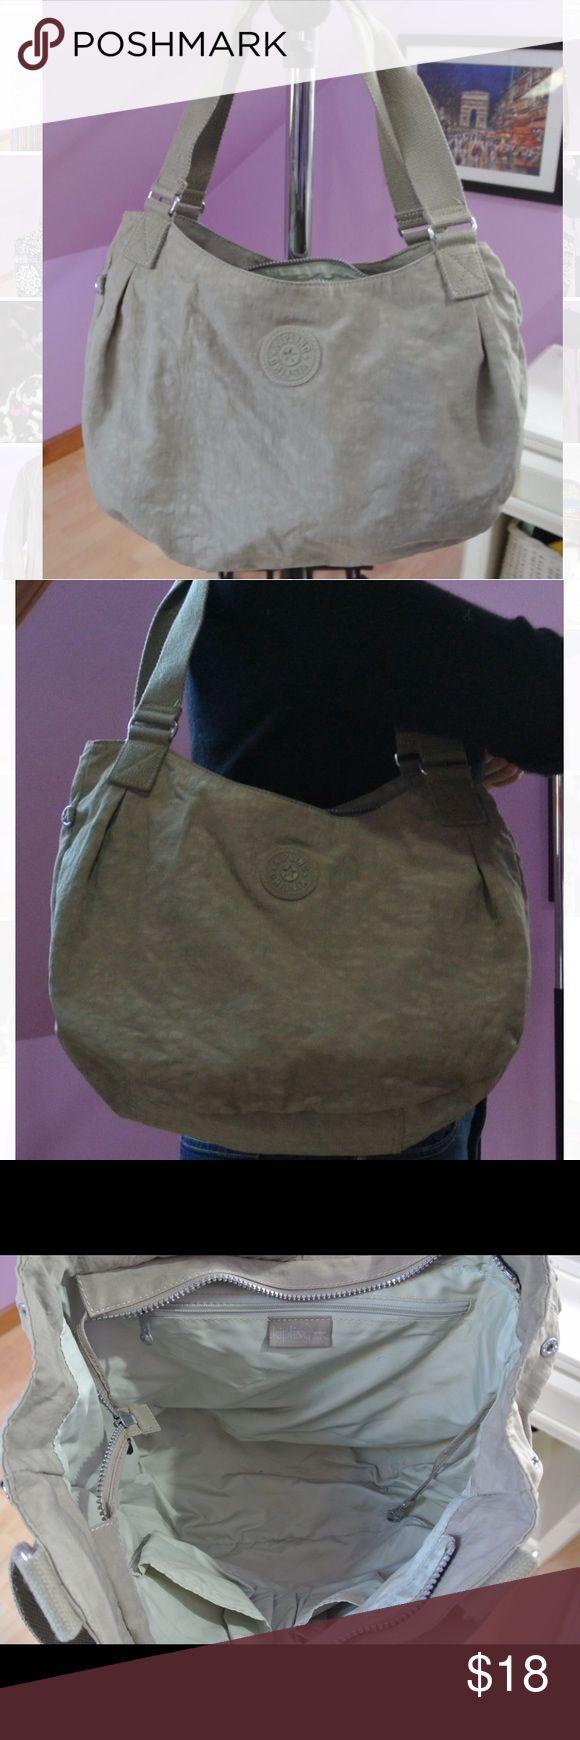 Kipling shoulder handbag Gently used Kipling shoulder handbag. Tan color. Very spacious. Can use it for school or as a gym bag. Kipling Bags Shoulder Bags